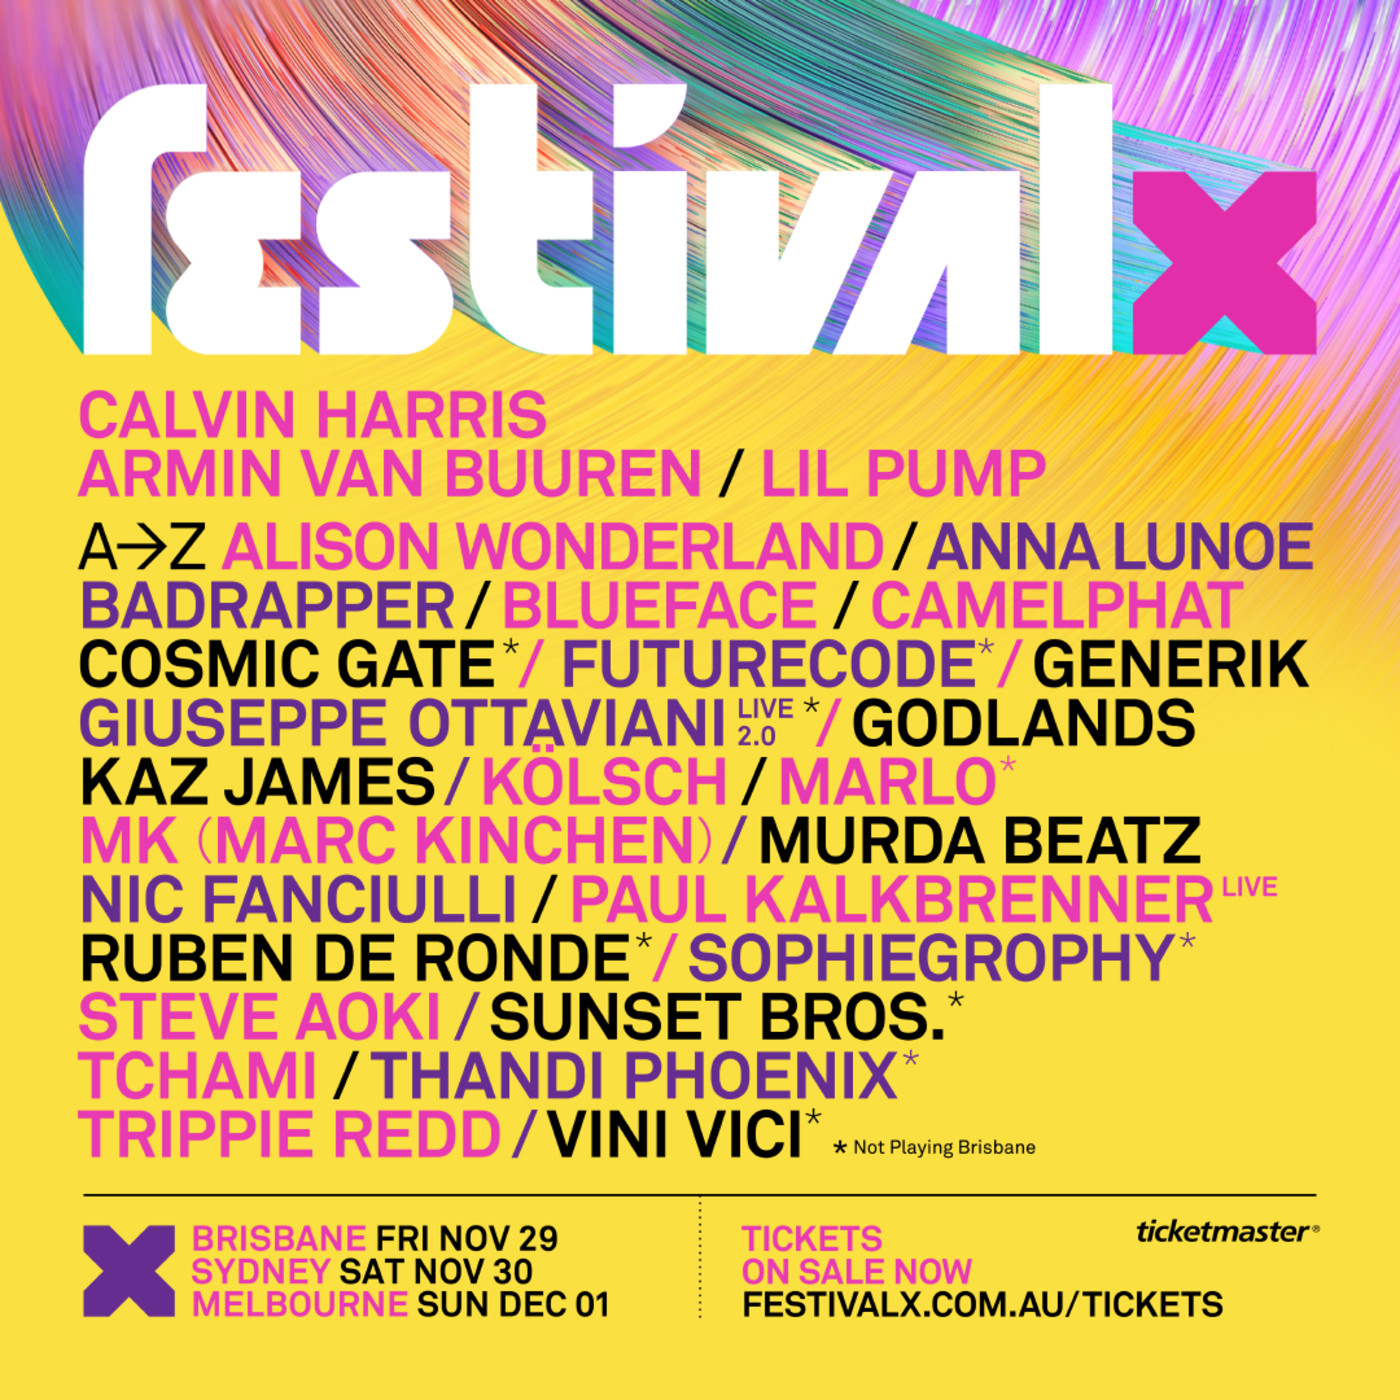 Festival X flier